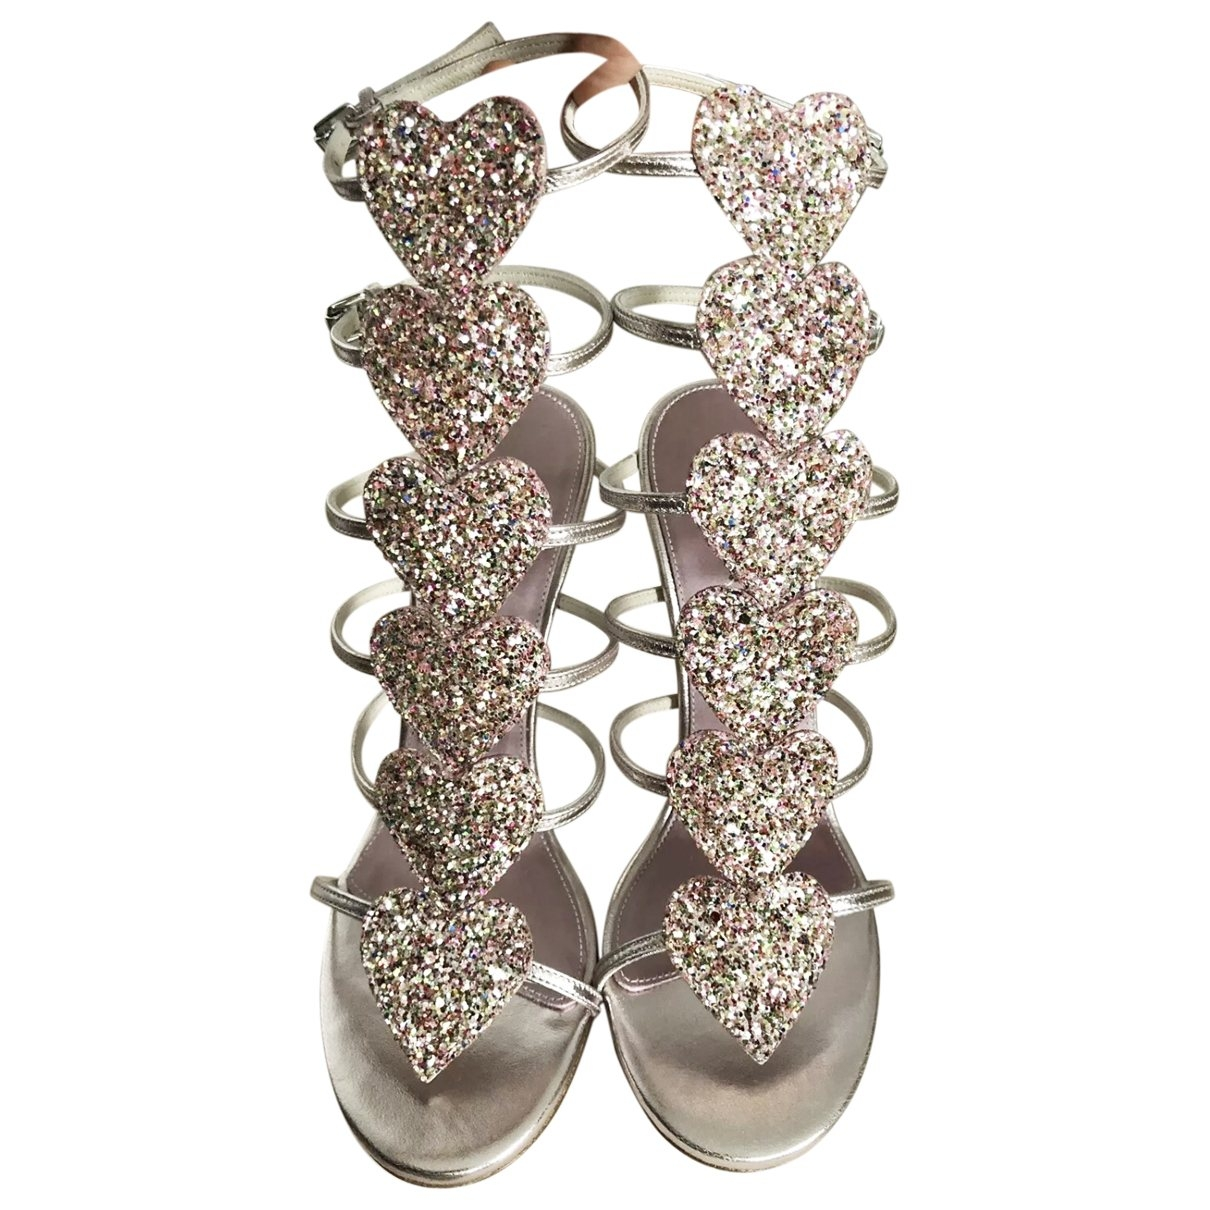 Giambattista Valli X H&m \N Pink Leather Sandals for Women 41 EU